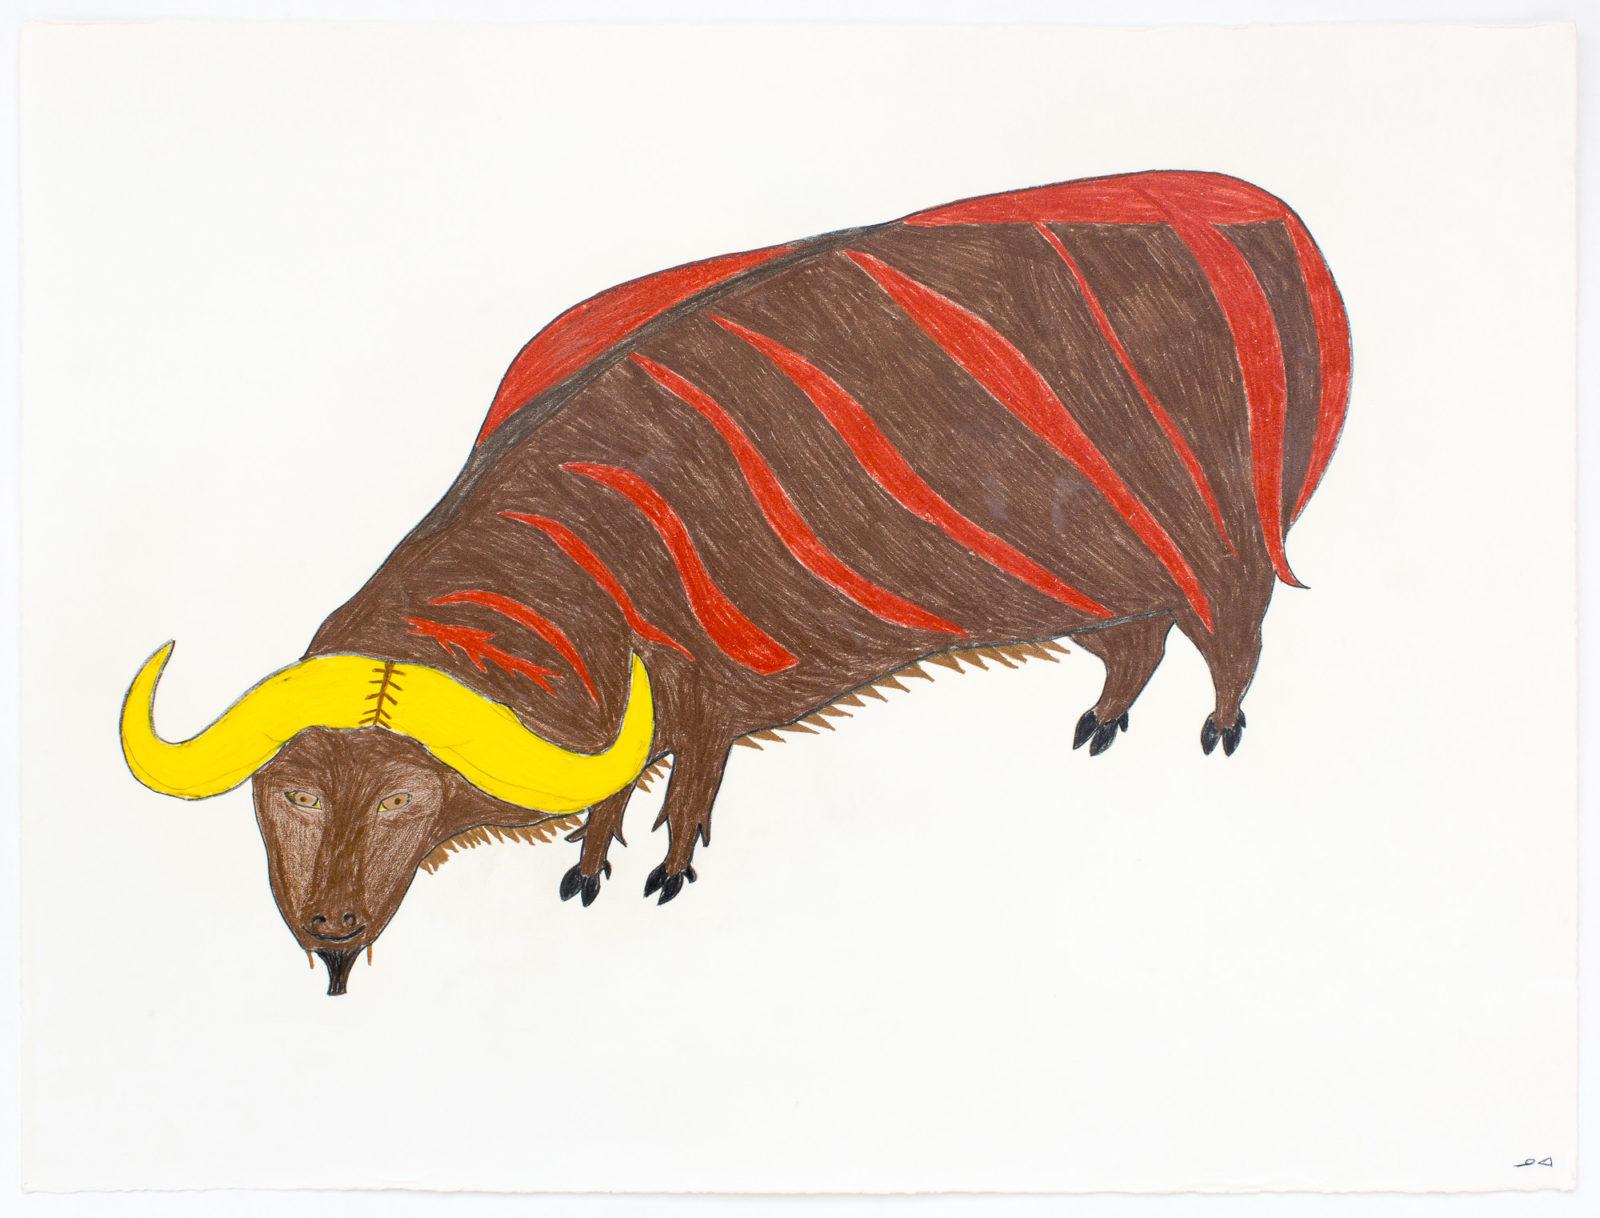 William Noah - Untitled (muskox)